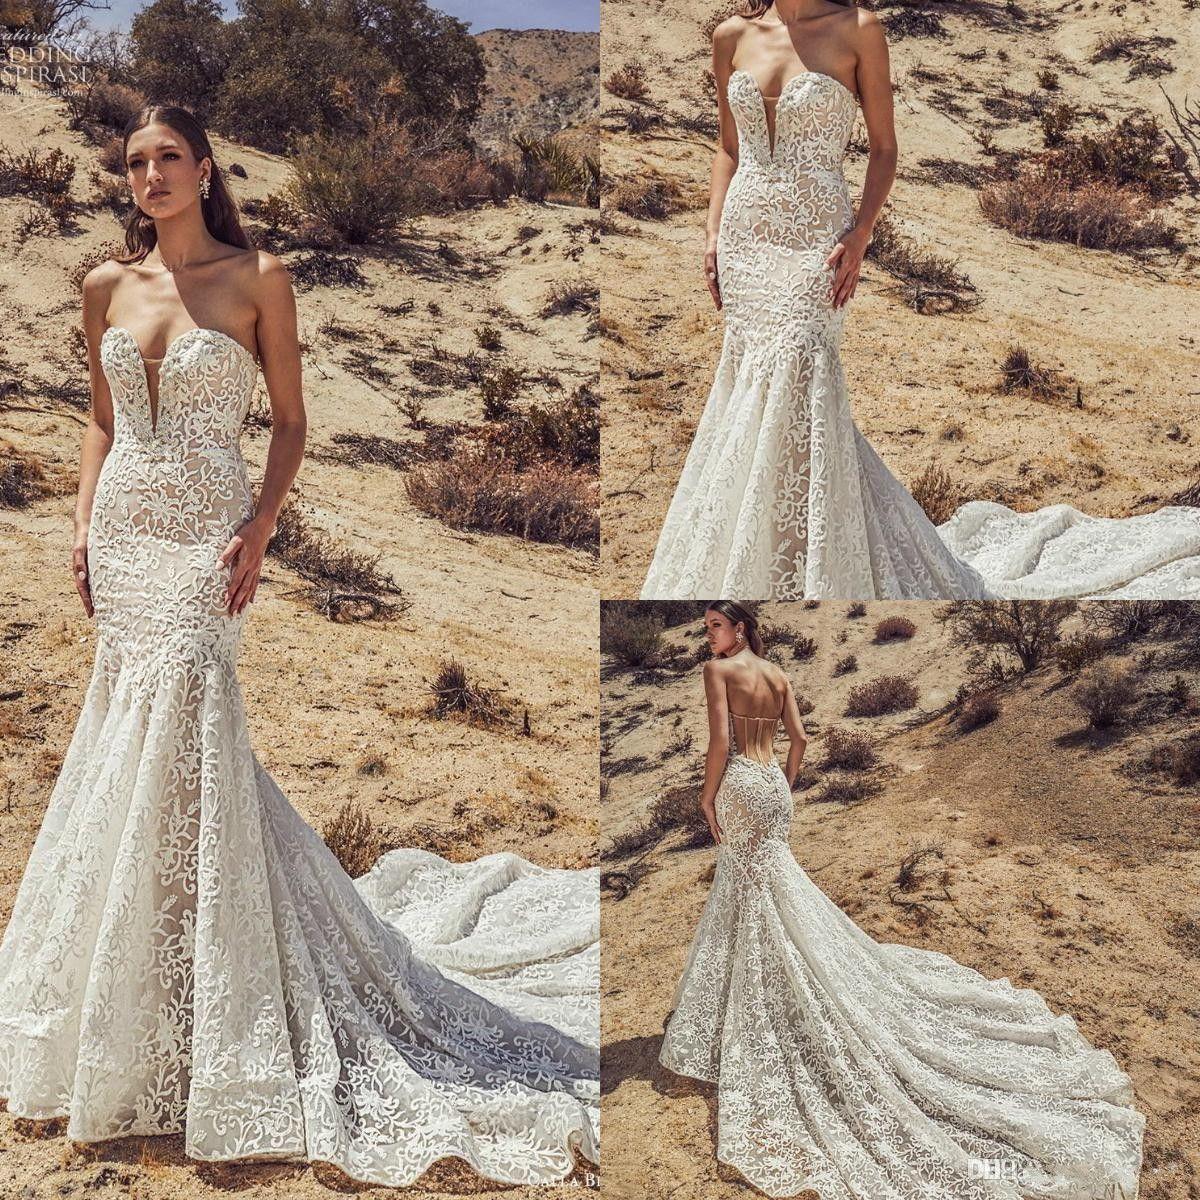 13b536118335 Vintage 2019 Julie Vino Mermaid Wedding Dresses Sweetheart Lace Appliqued Bridal  Gowns Vestido De Novia Sweep Train Wedding Dress Sleeveless Wedding Dresses  ...